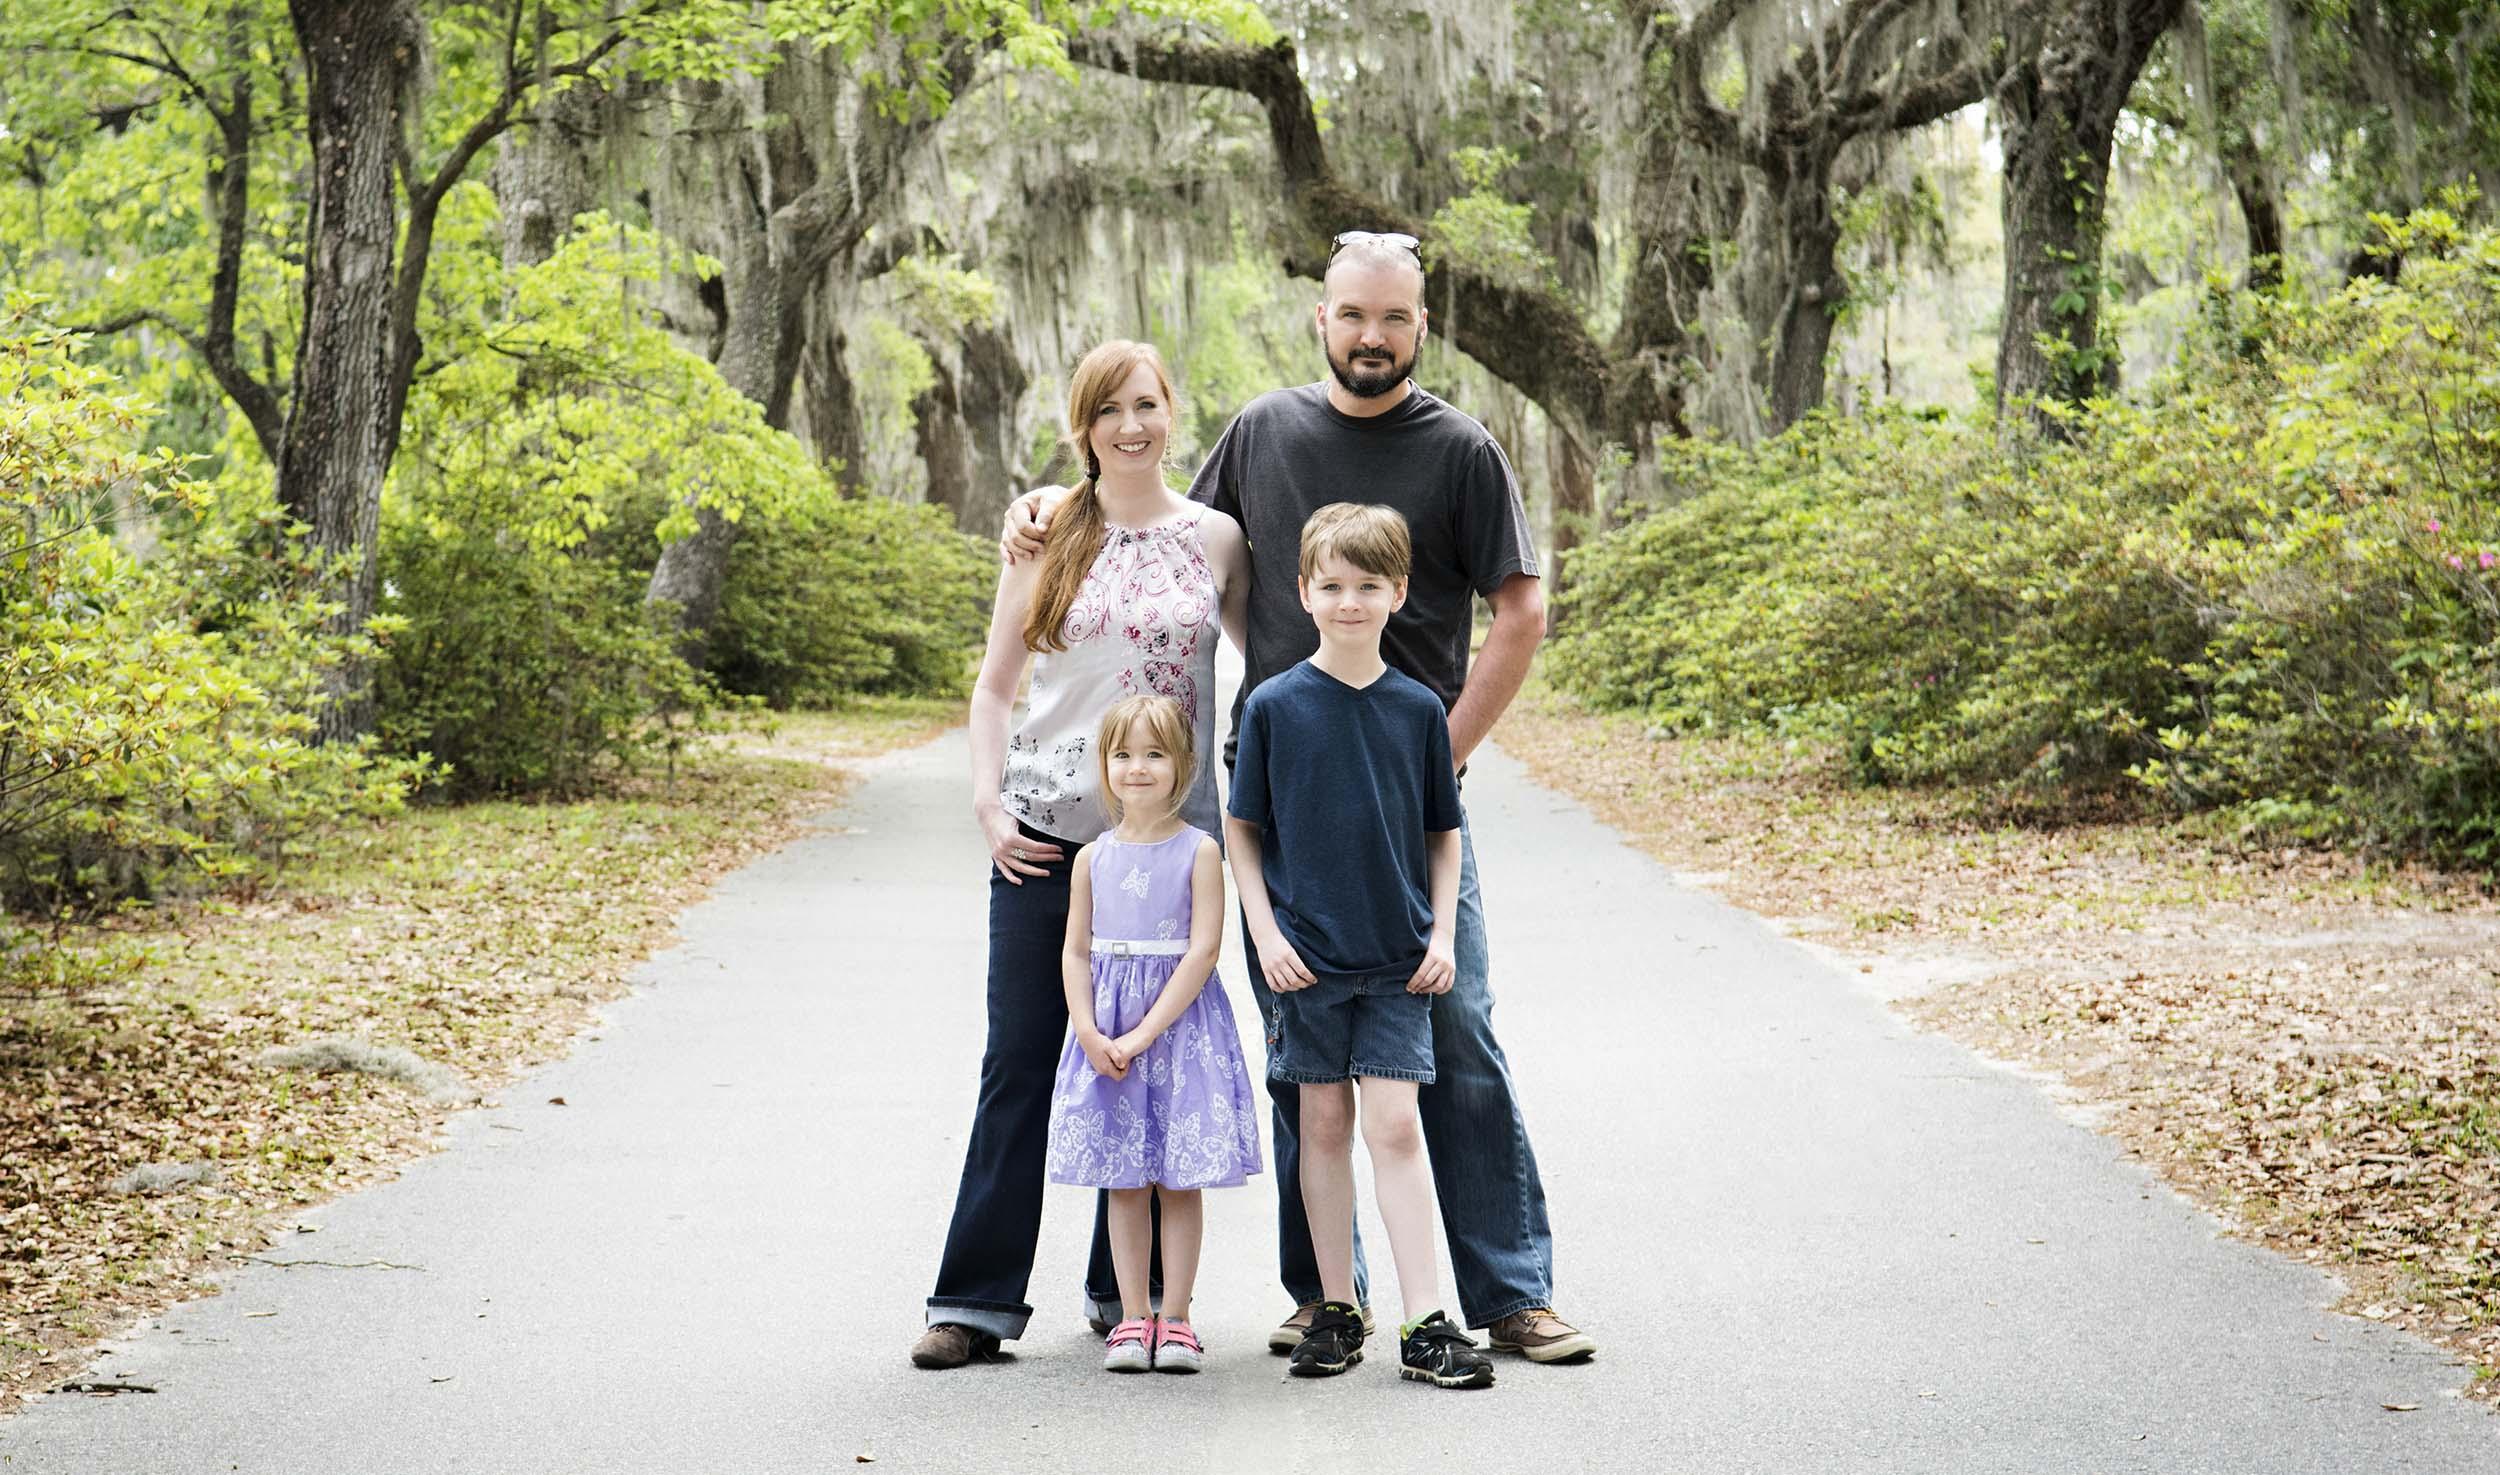 Family trip to Savannah, GA 2017